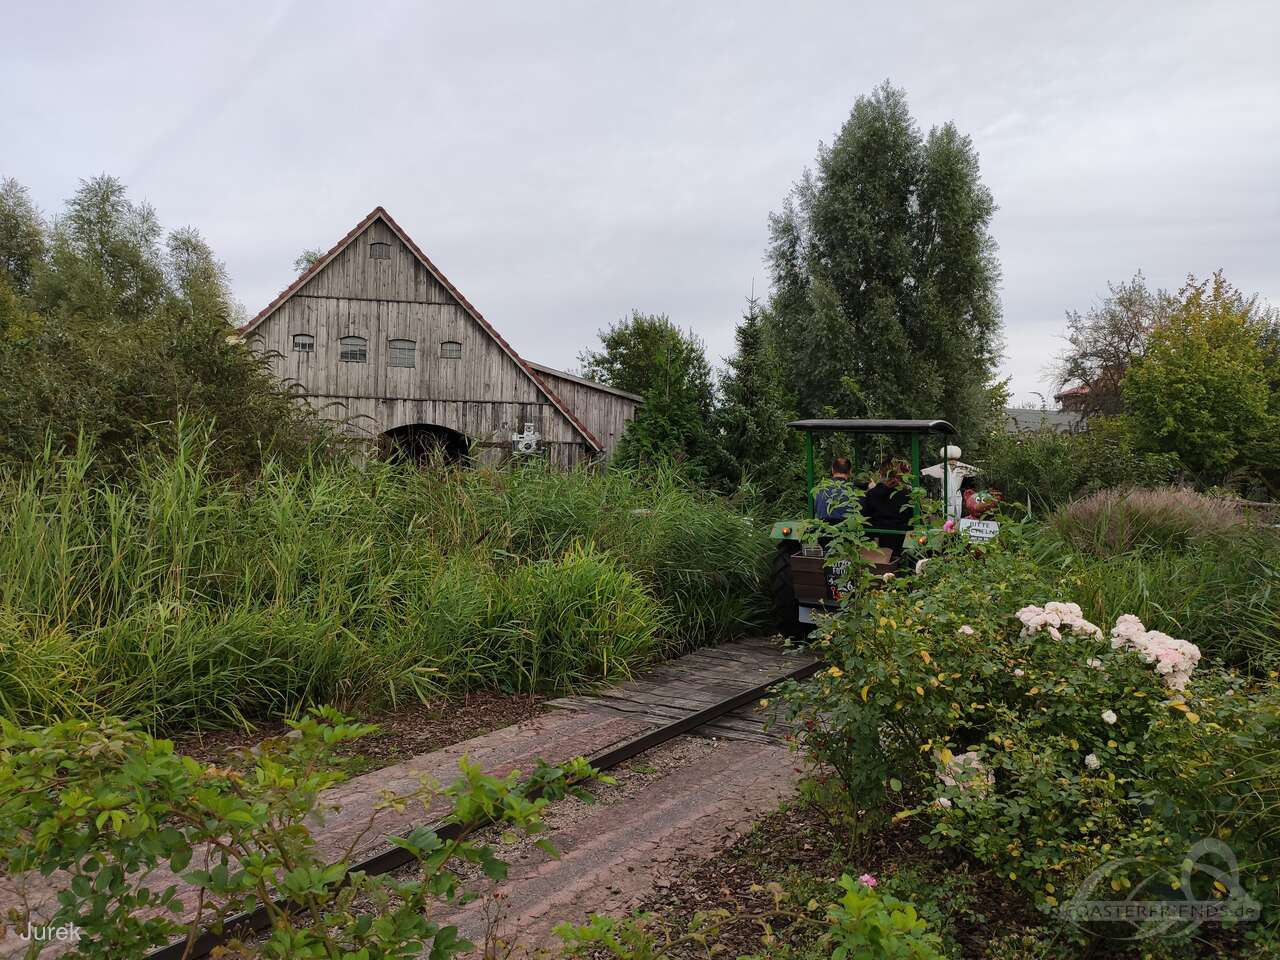 Karls Erlebnis-Dorf Rövershagen Impressionen